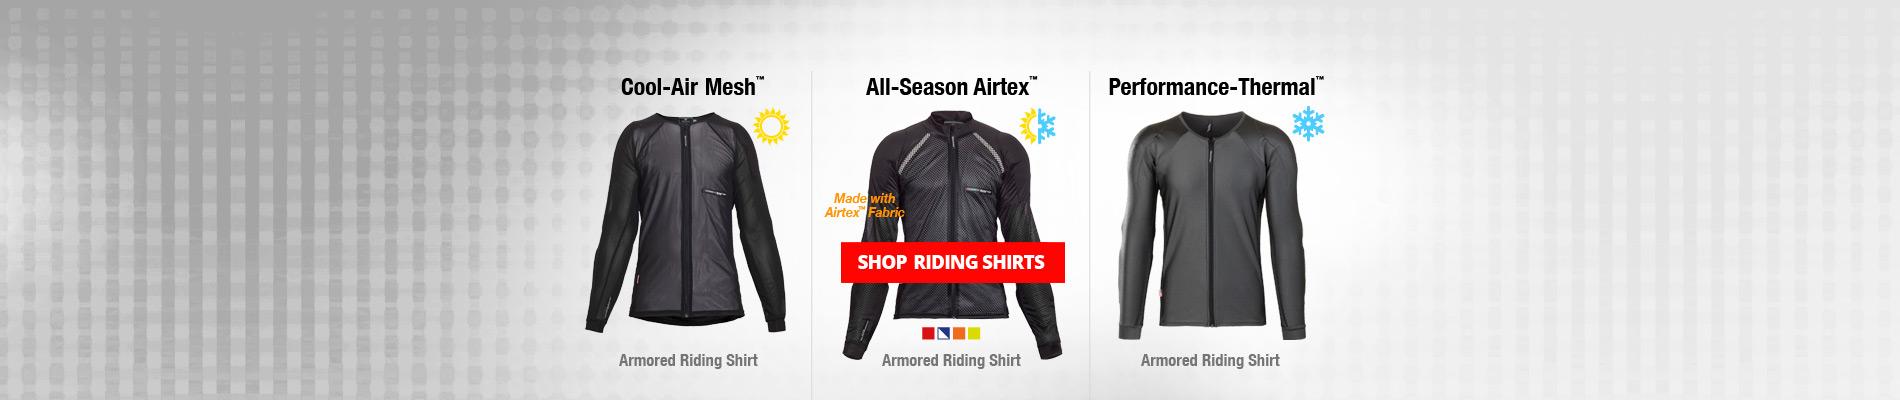 sale on riding Bohn Armor shirts graphic